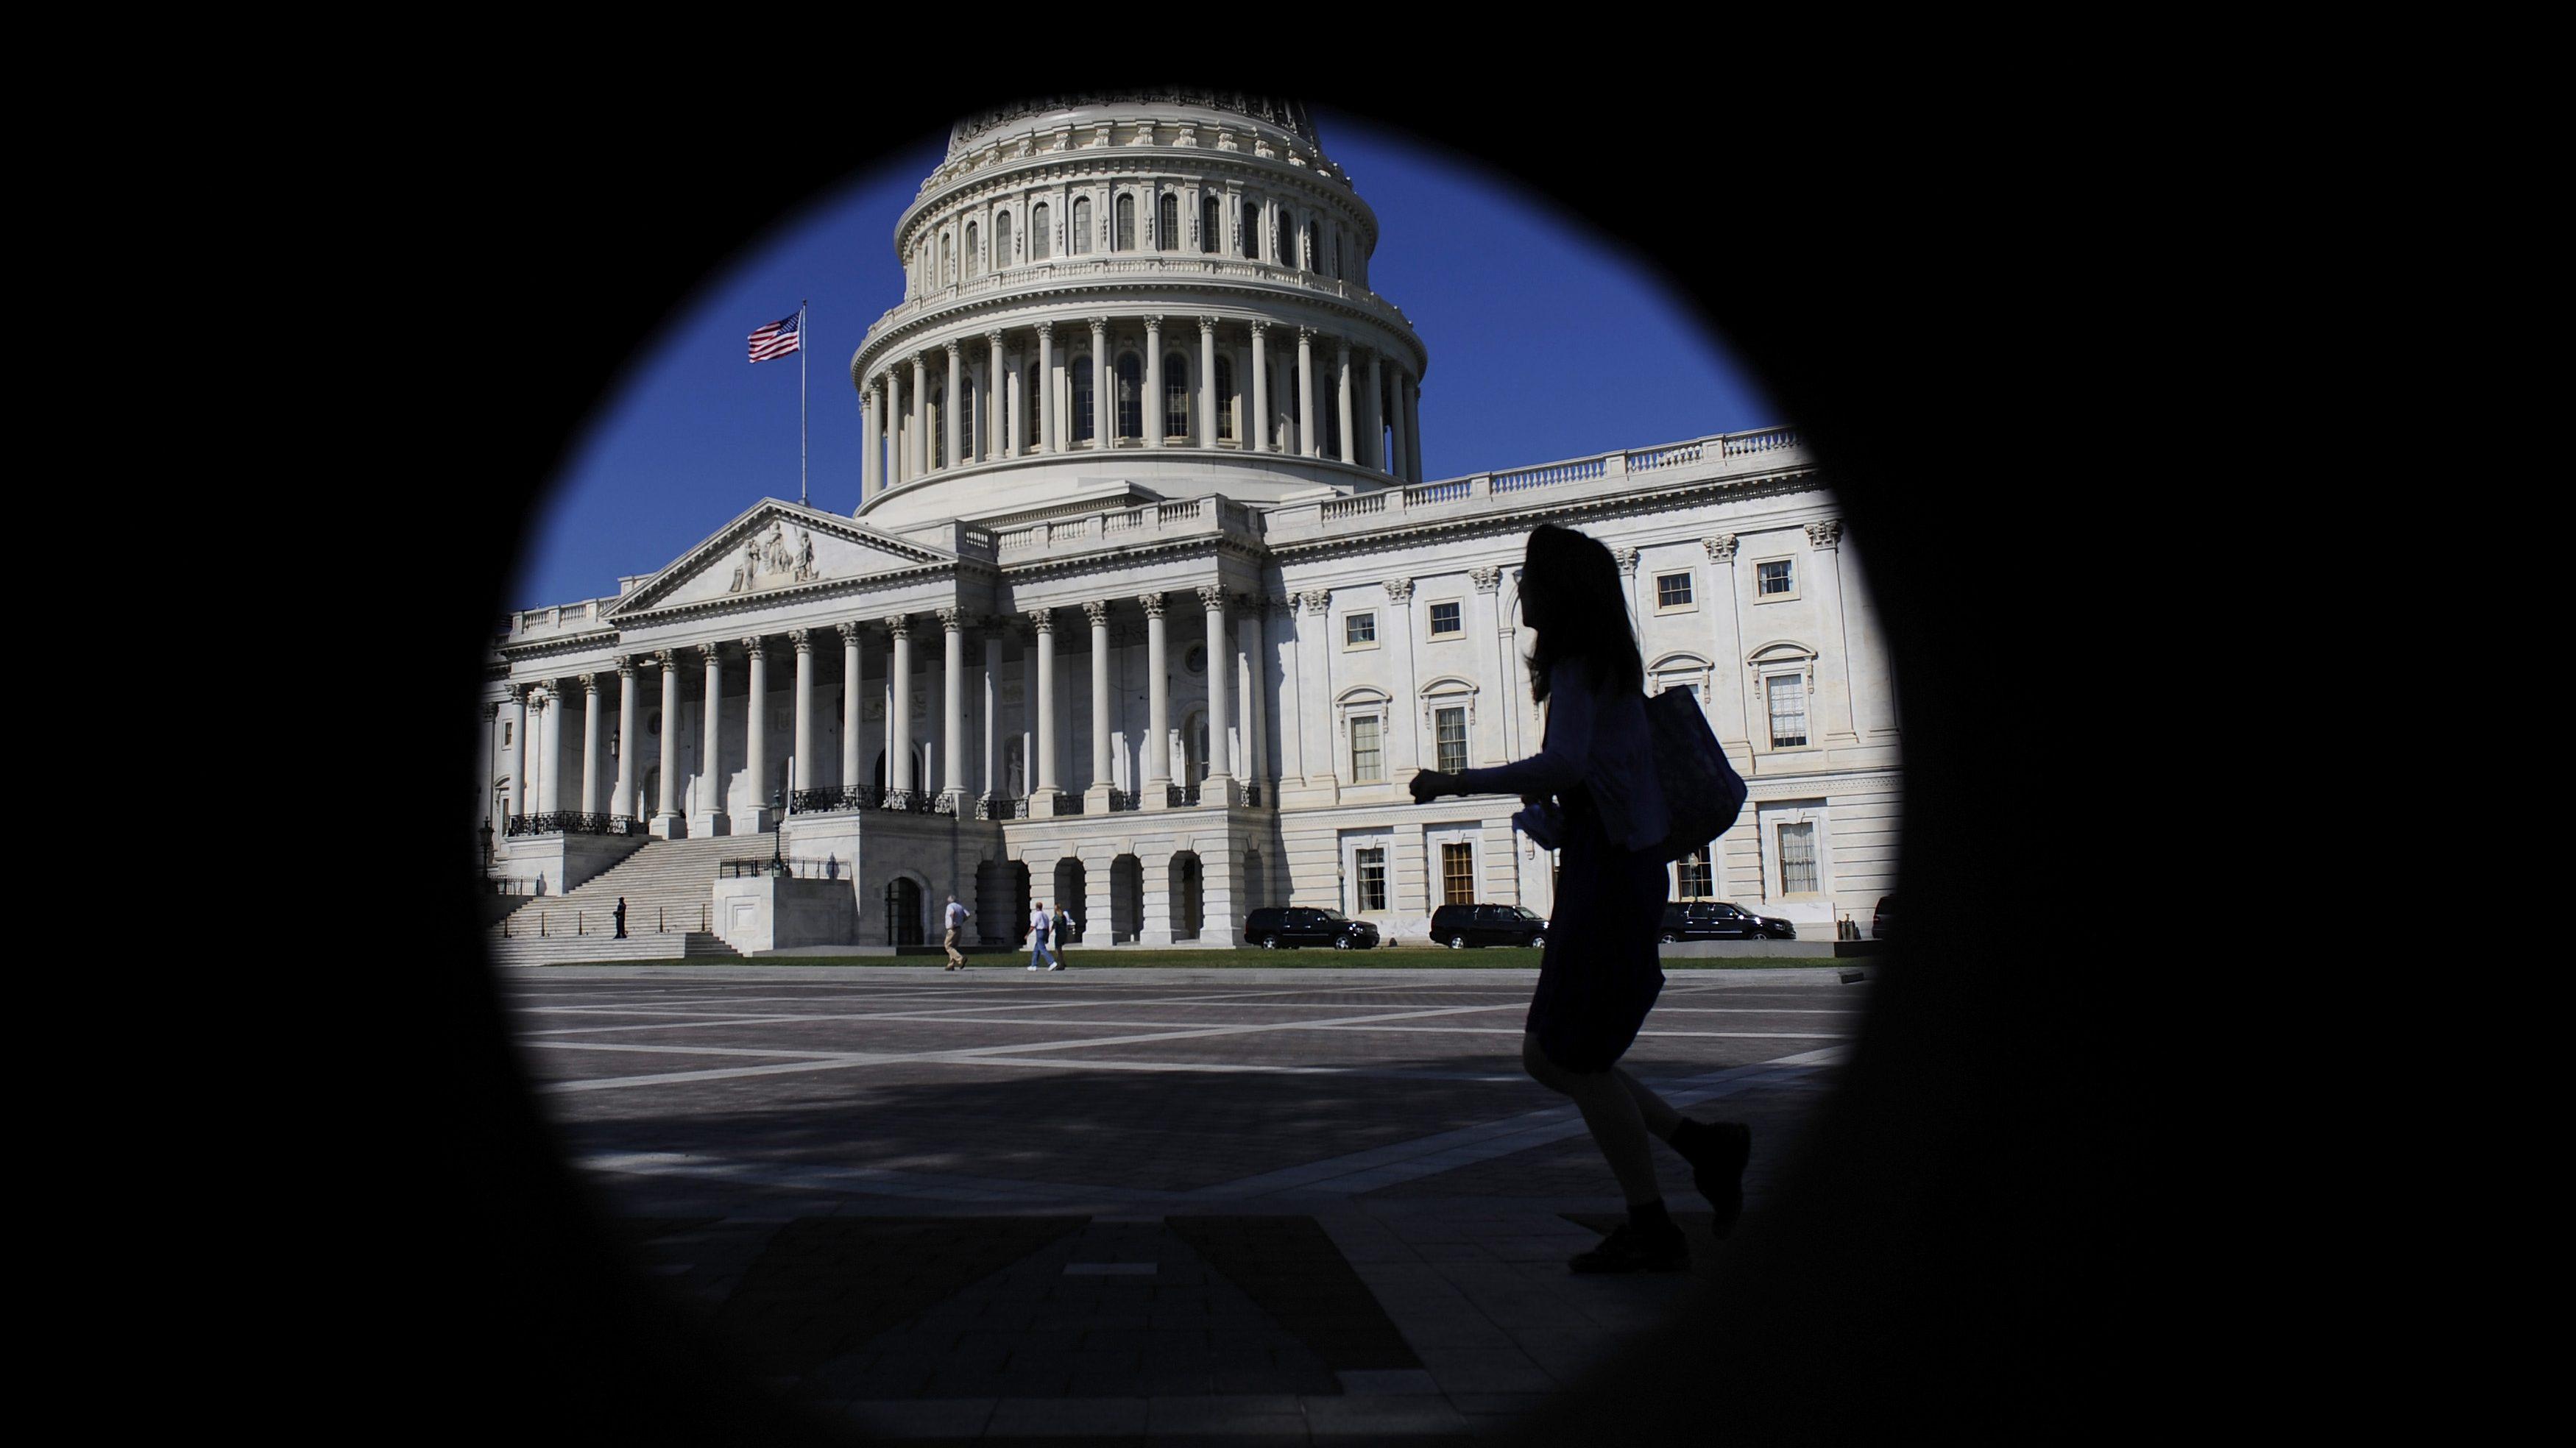 A woman walks past the US Capitol Building